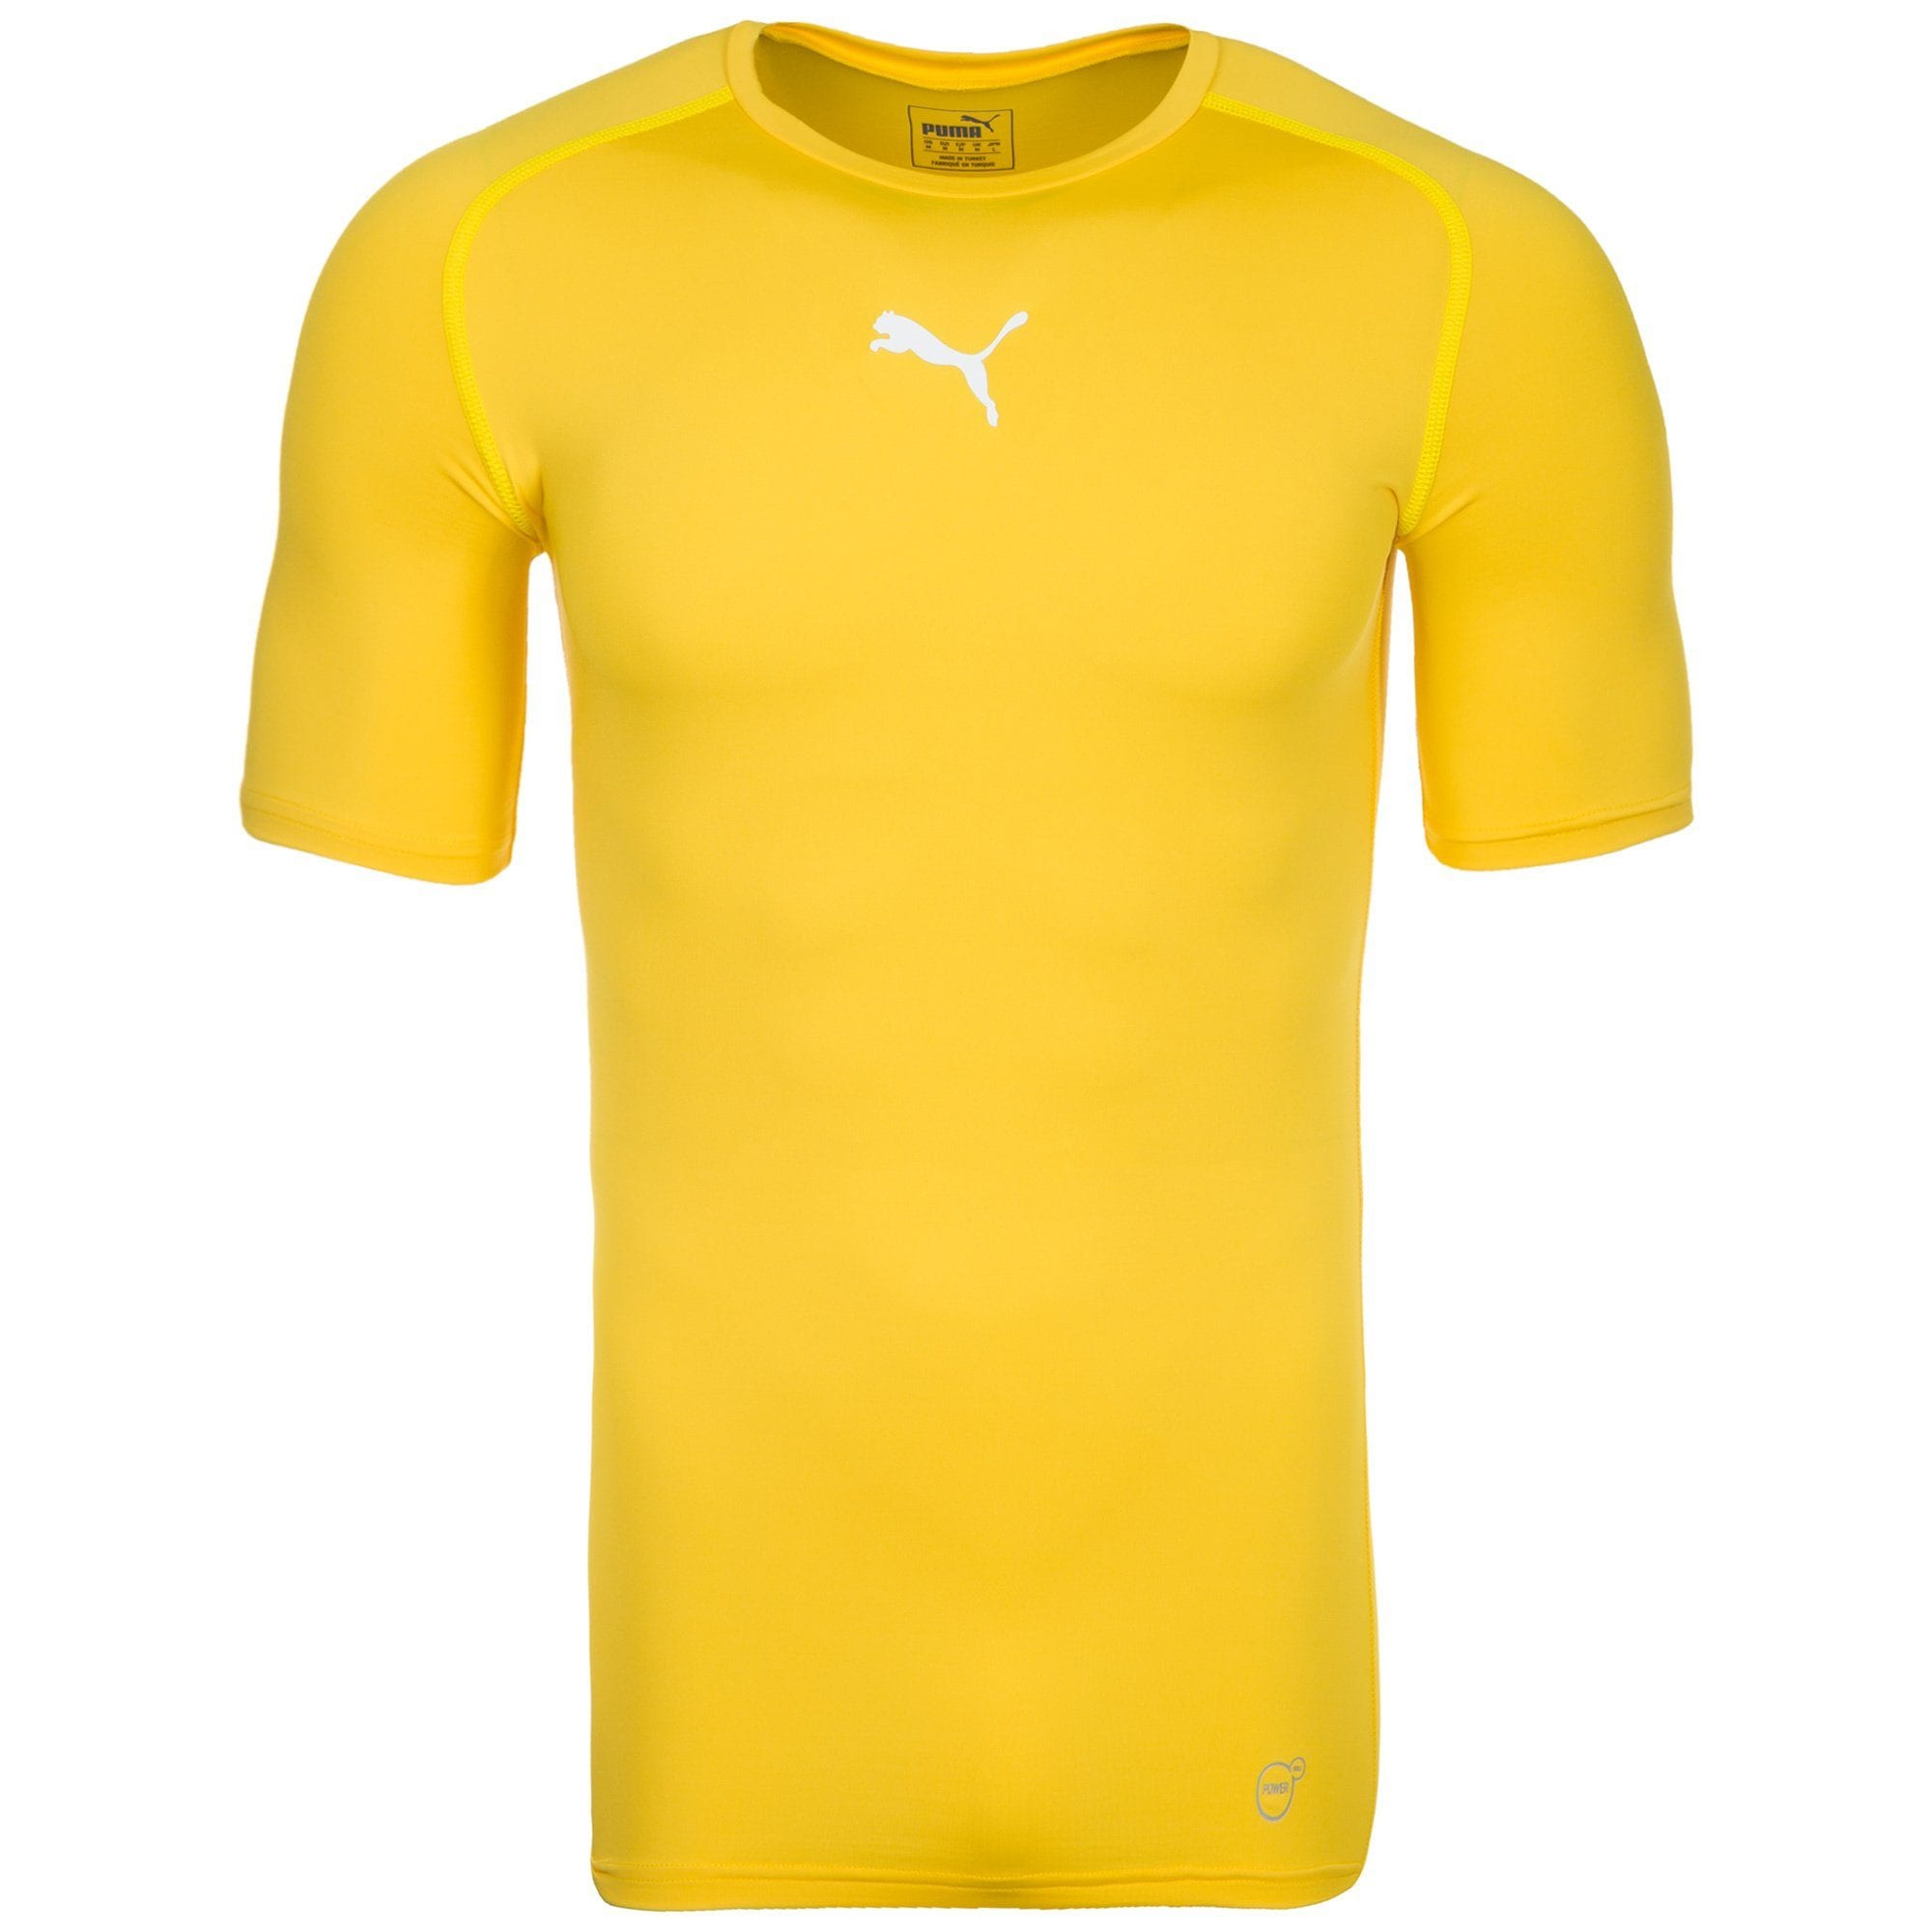 PUMA TB Trainingsshirt Herren | Sportbekleidung > Sportshirts > Funktionsshirts | Gelb | Polyester - Elasthan | PUMA